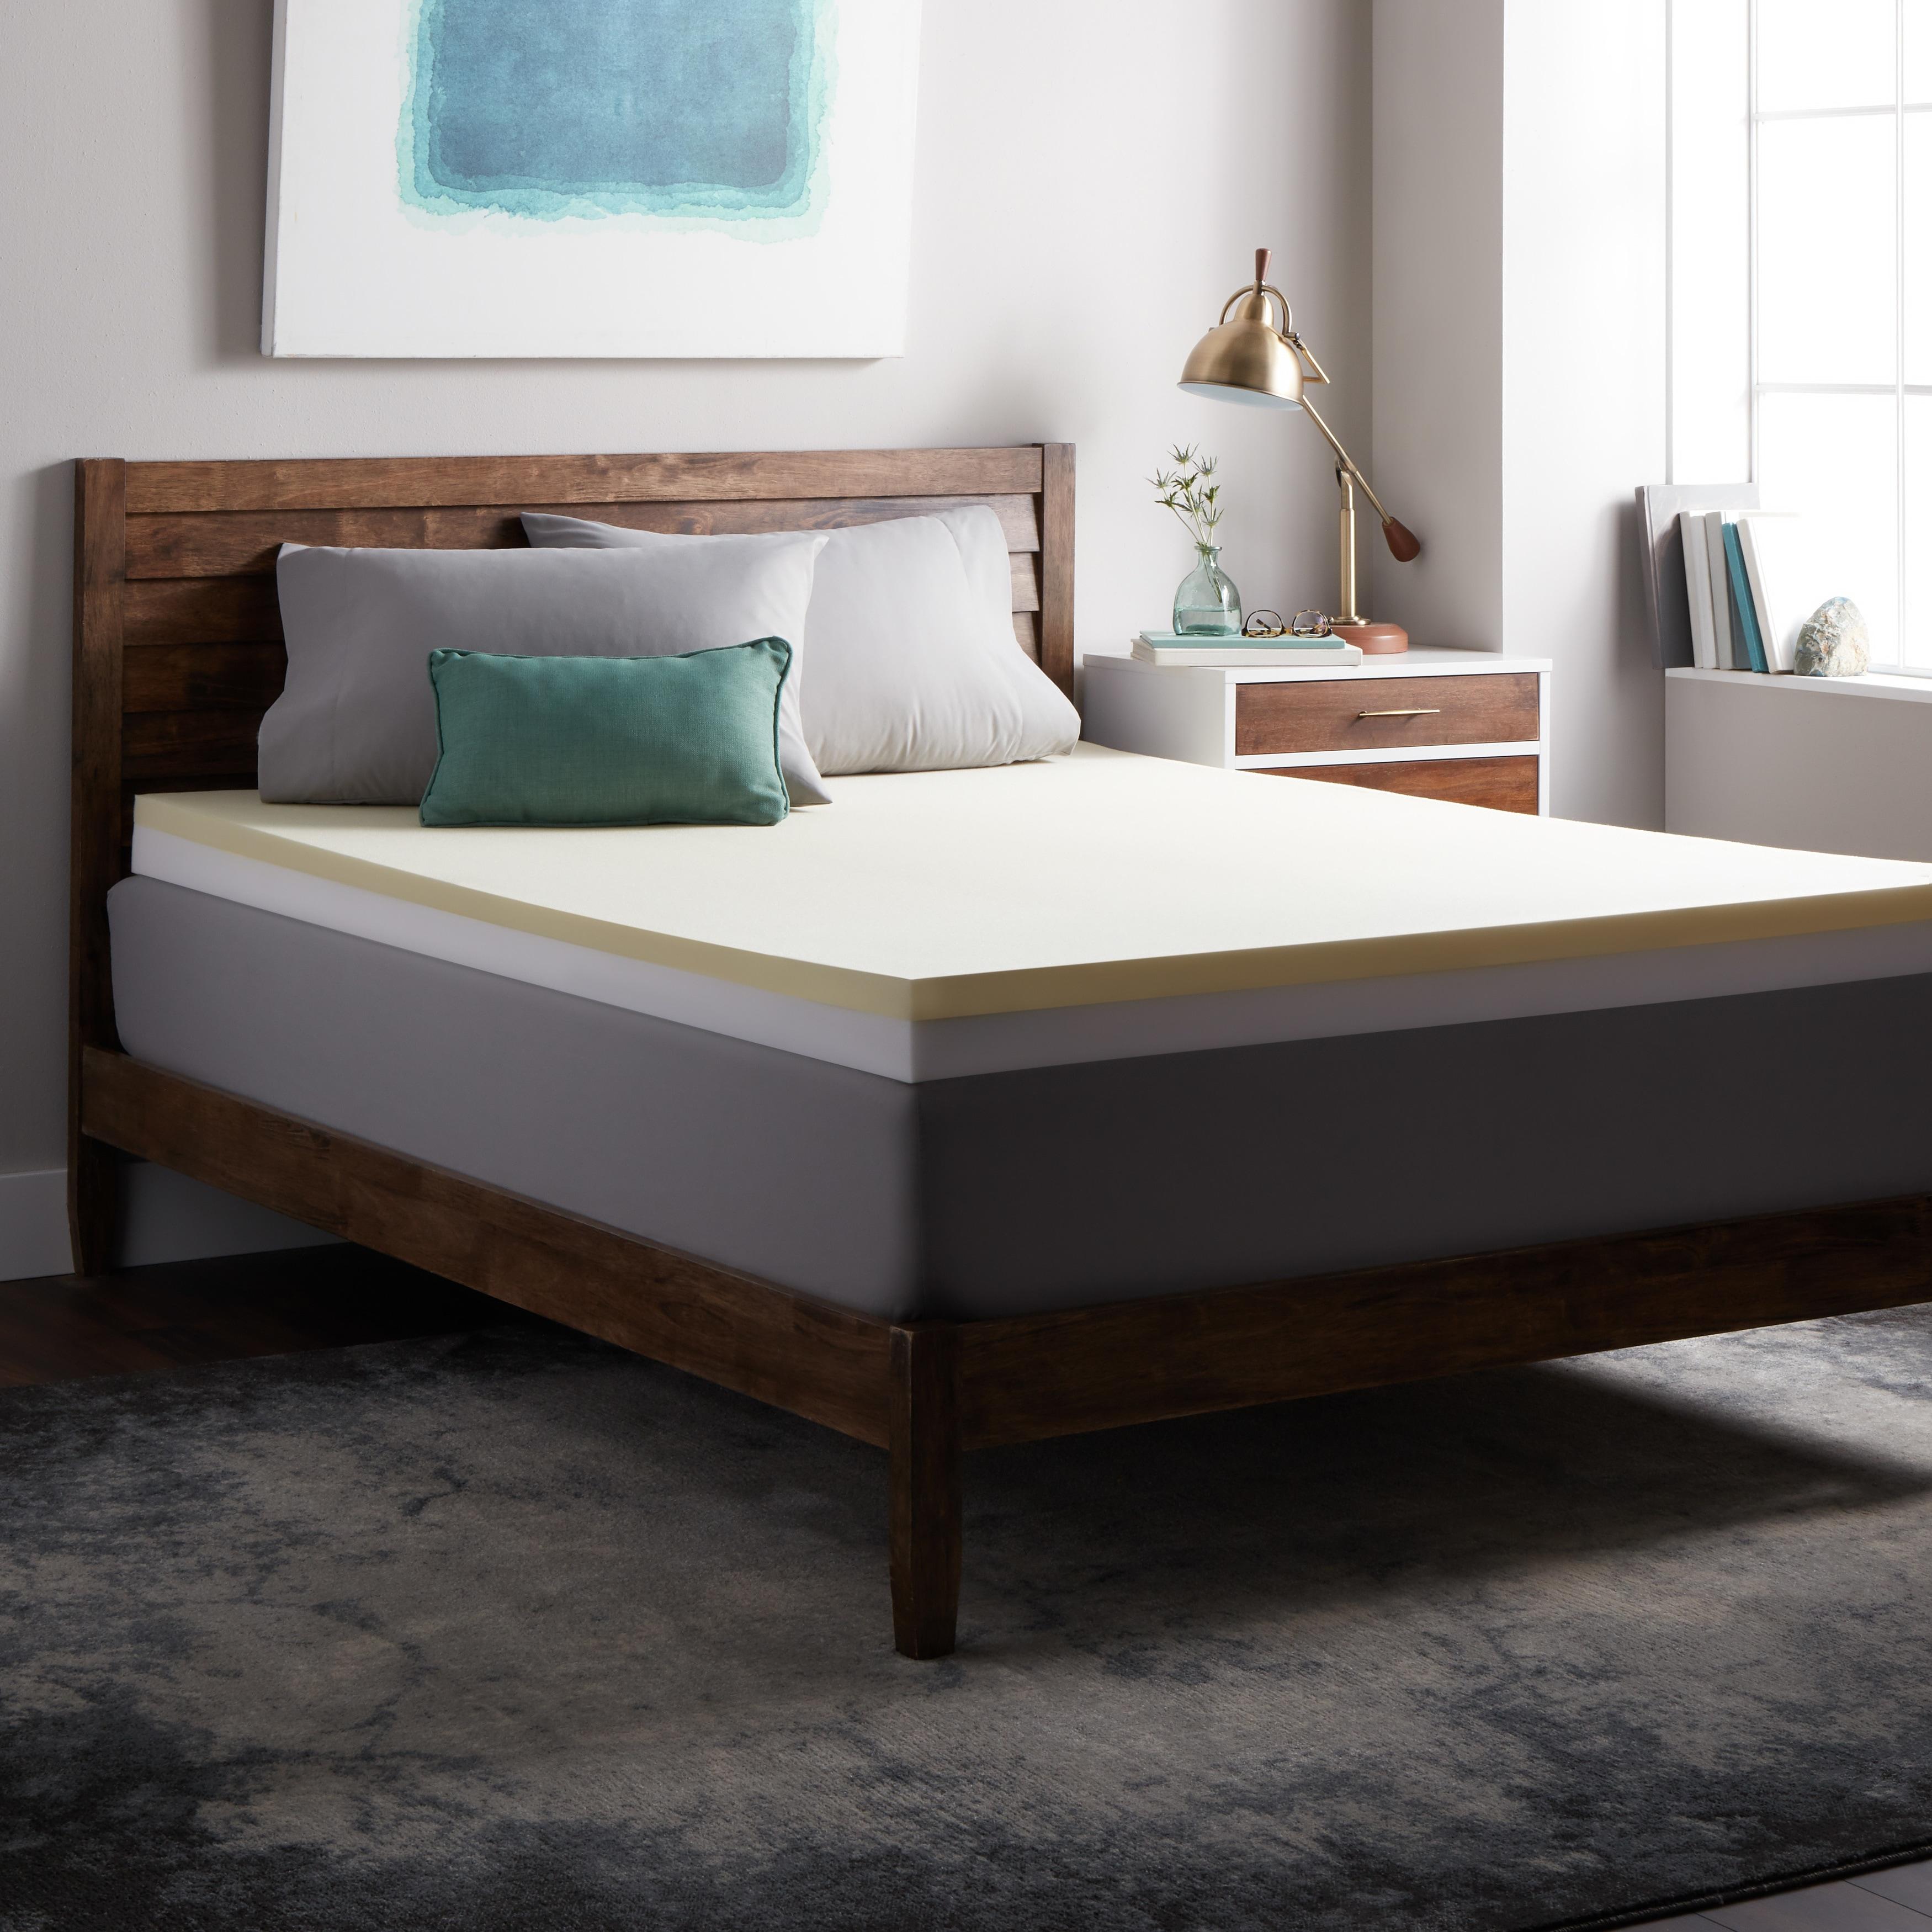 Select Luxury 4 Inch Restore A Mattress Foam And Memory Foam